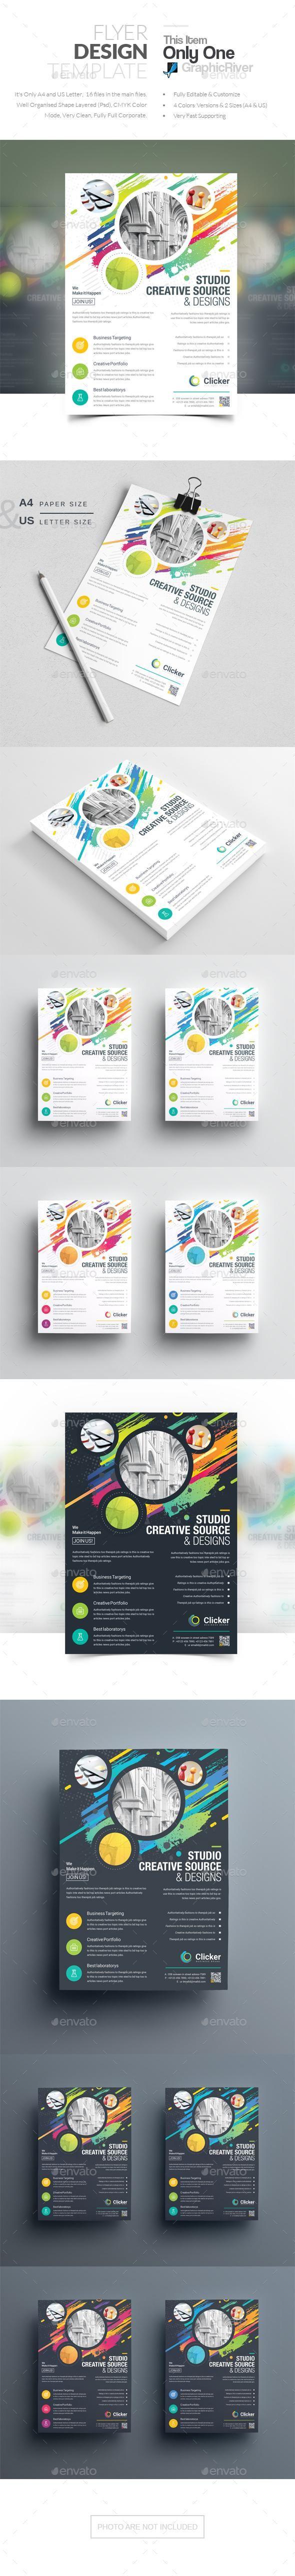 Flyer For 6 Flyer Business Flyerdesign Printdesign Flyertemplates Corporateflyer G Graphic Design Flyer Graphic Design Business Leaflet Design Template